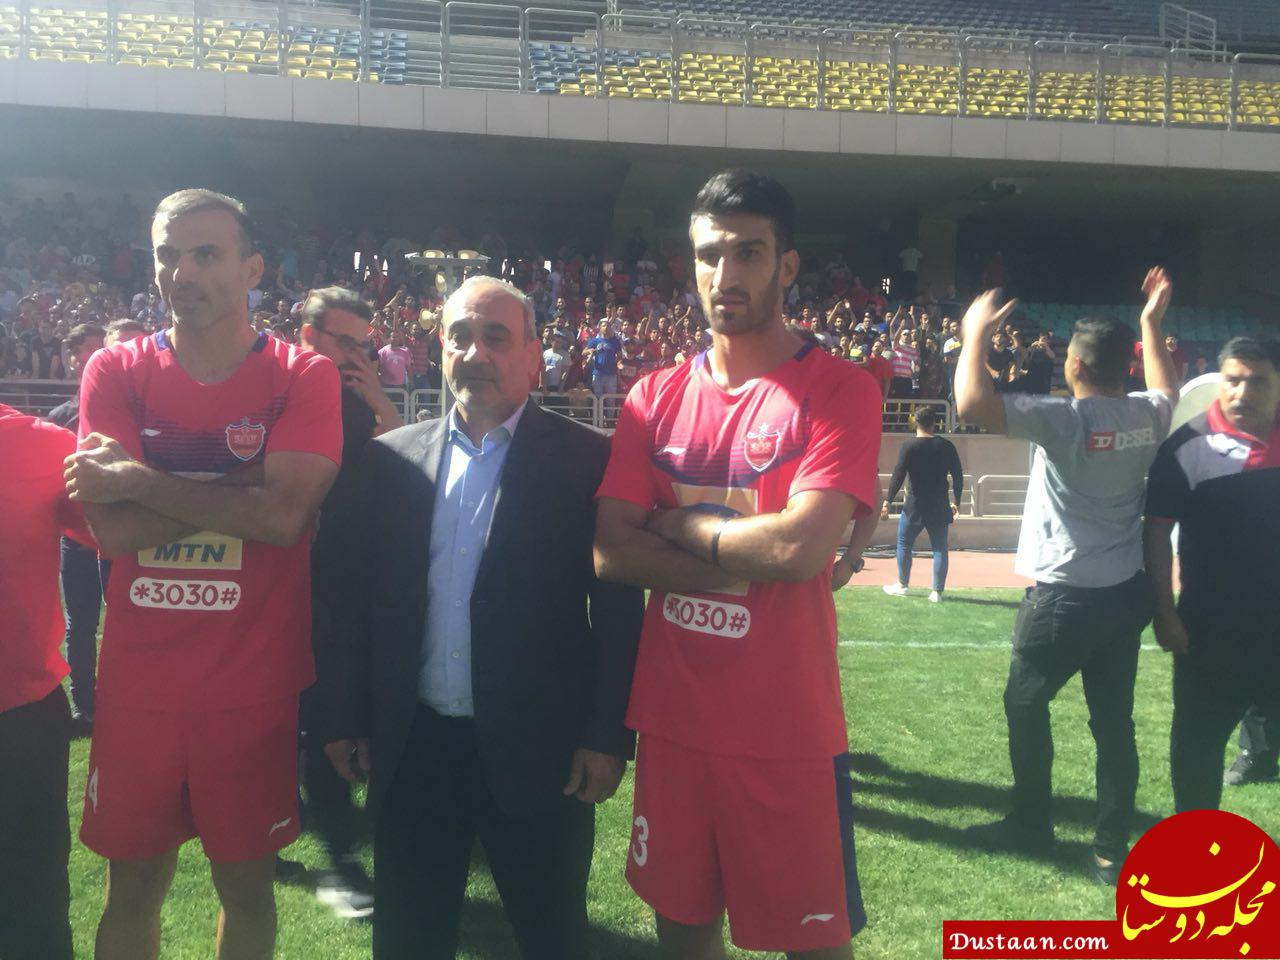 www.dustaan.com عاقبت لیدرپروری در باشگاه پرسپولیس!